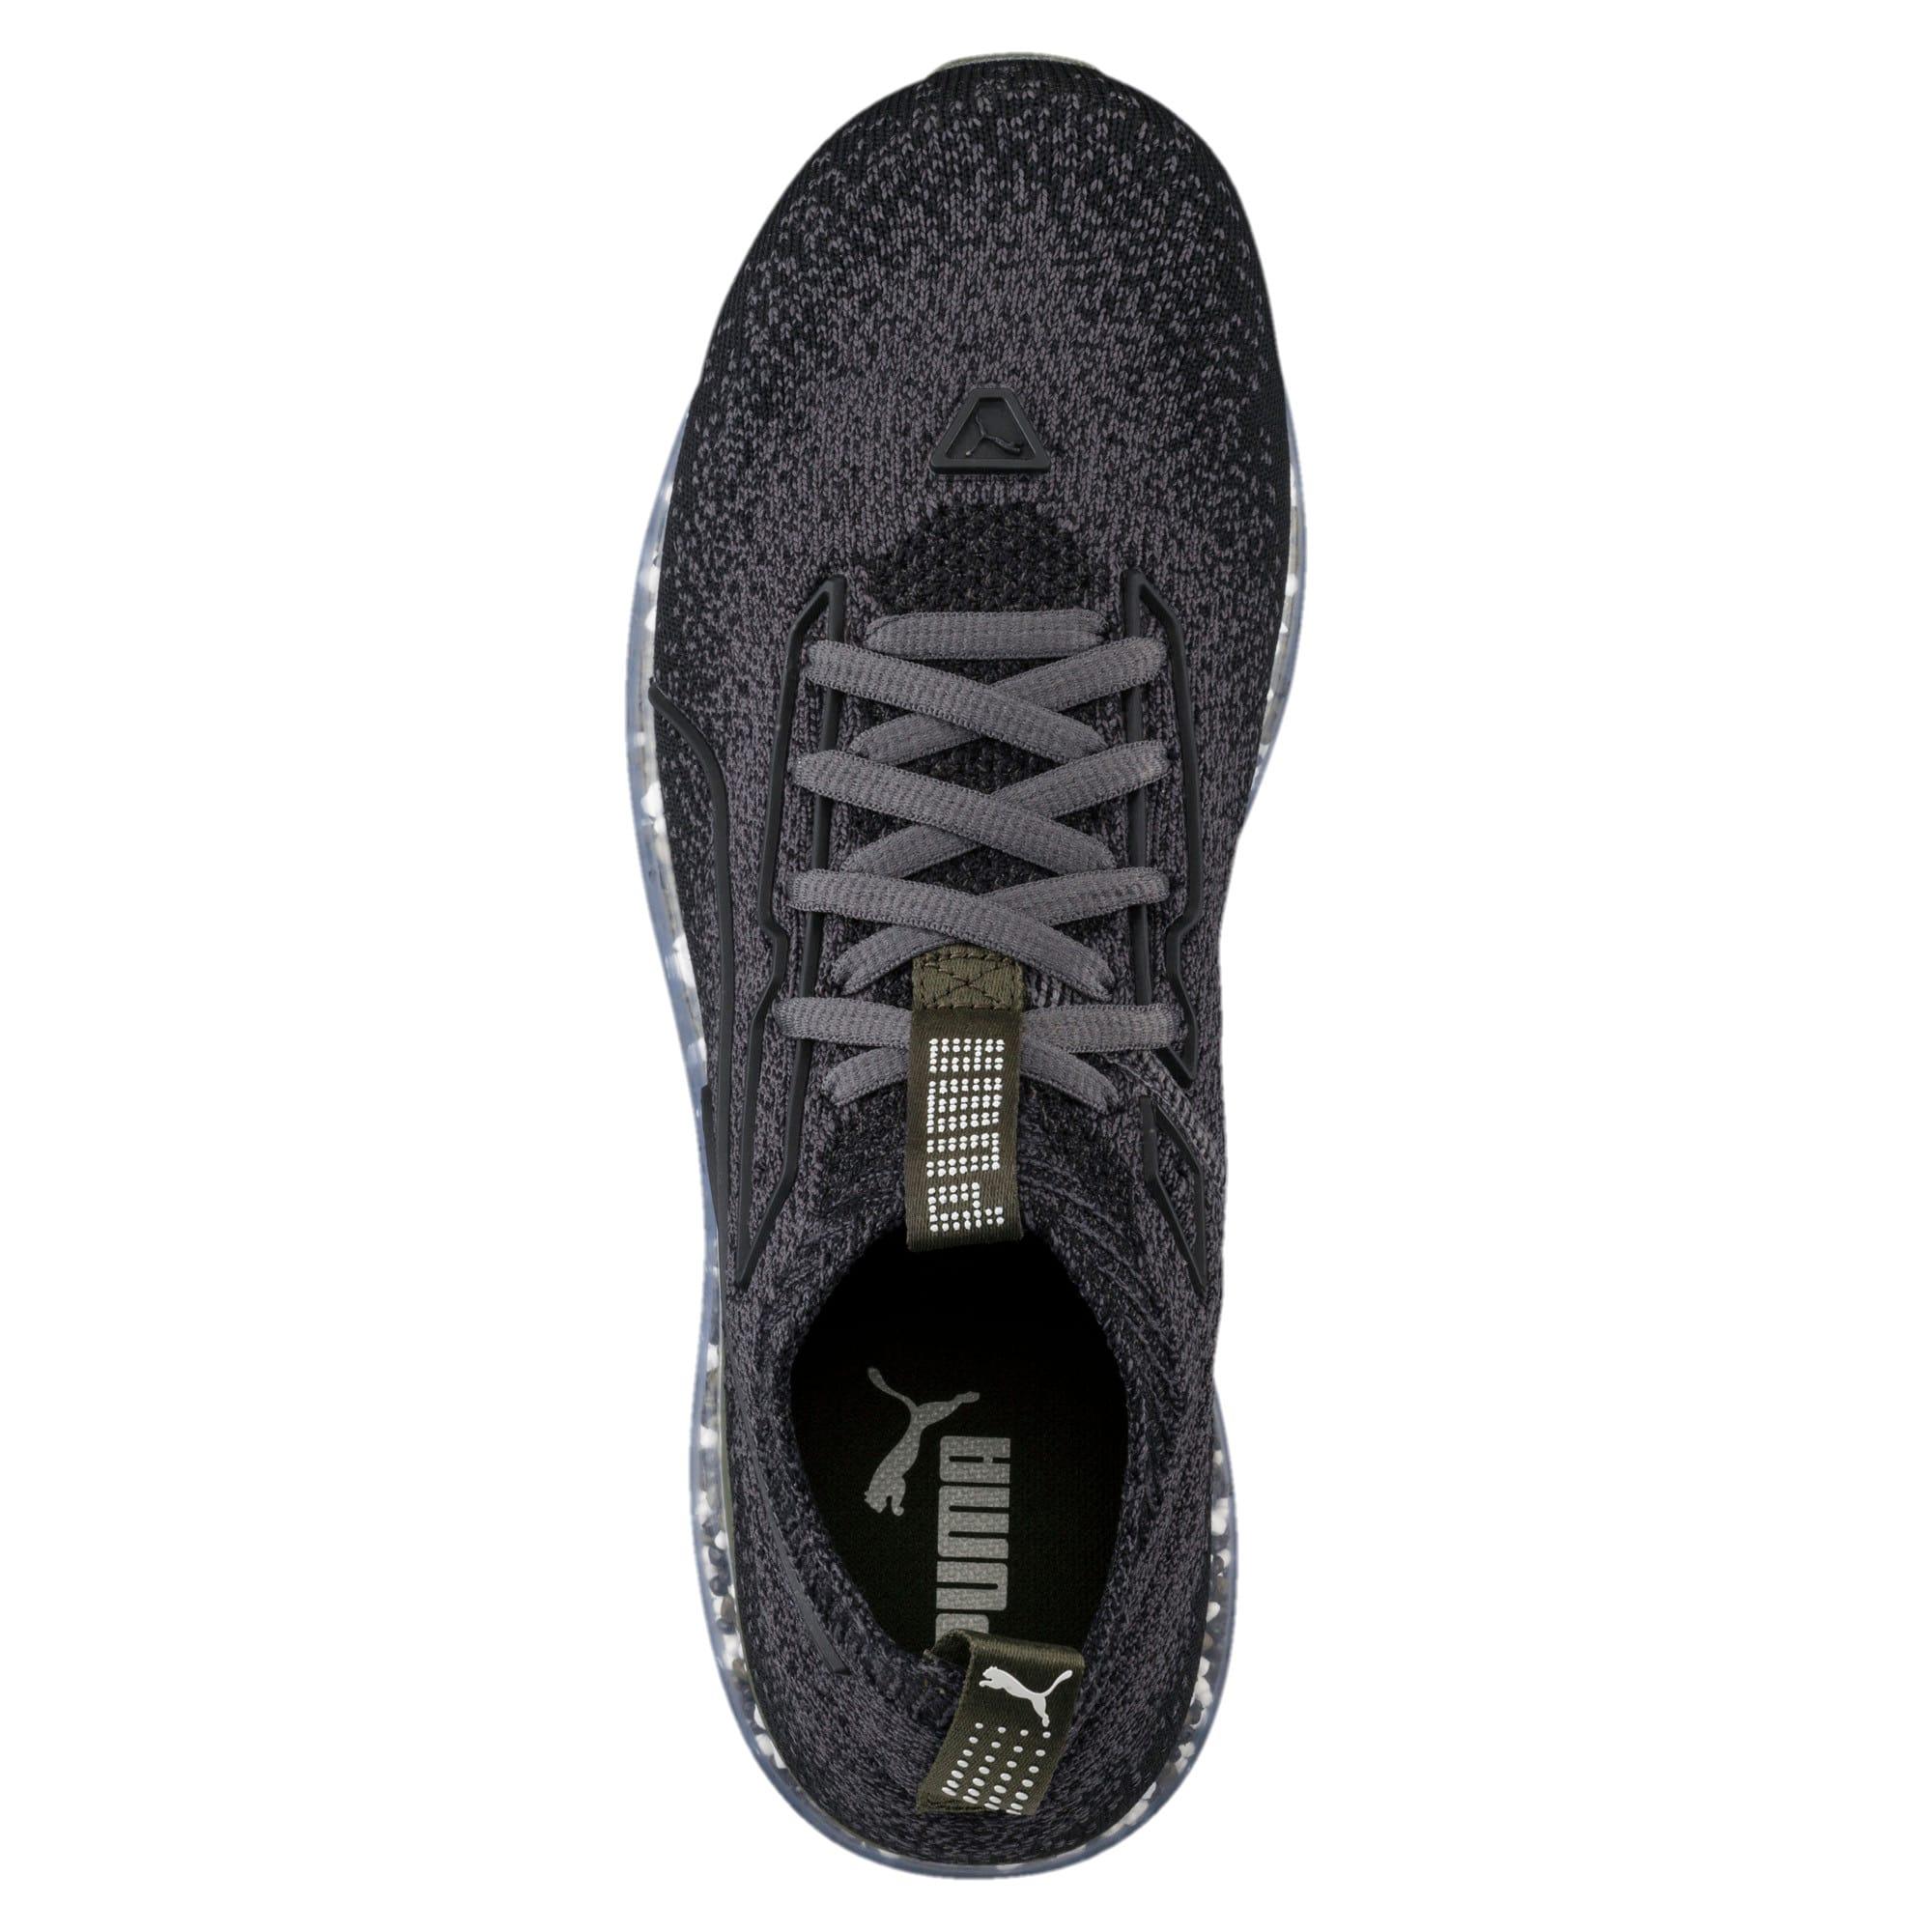 Thumbnail 5 of Jamming Women's Running Shoes, Puma Black-Forest Night, medium